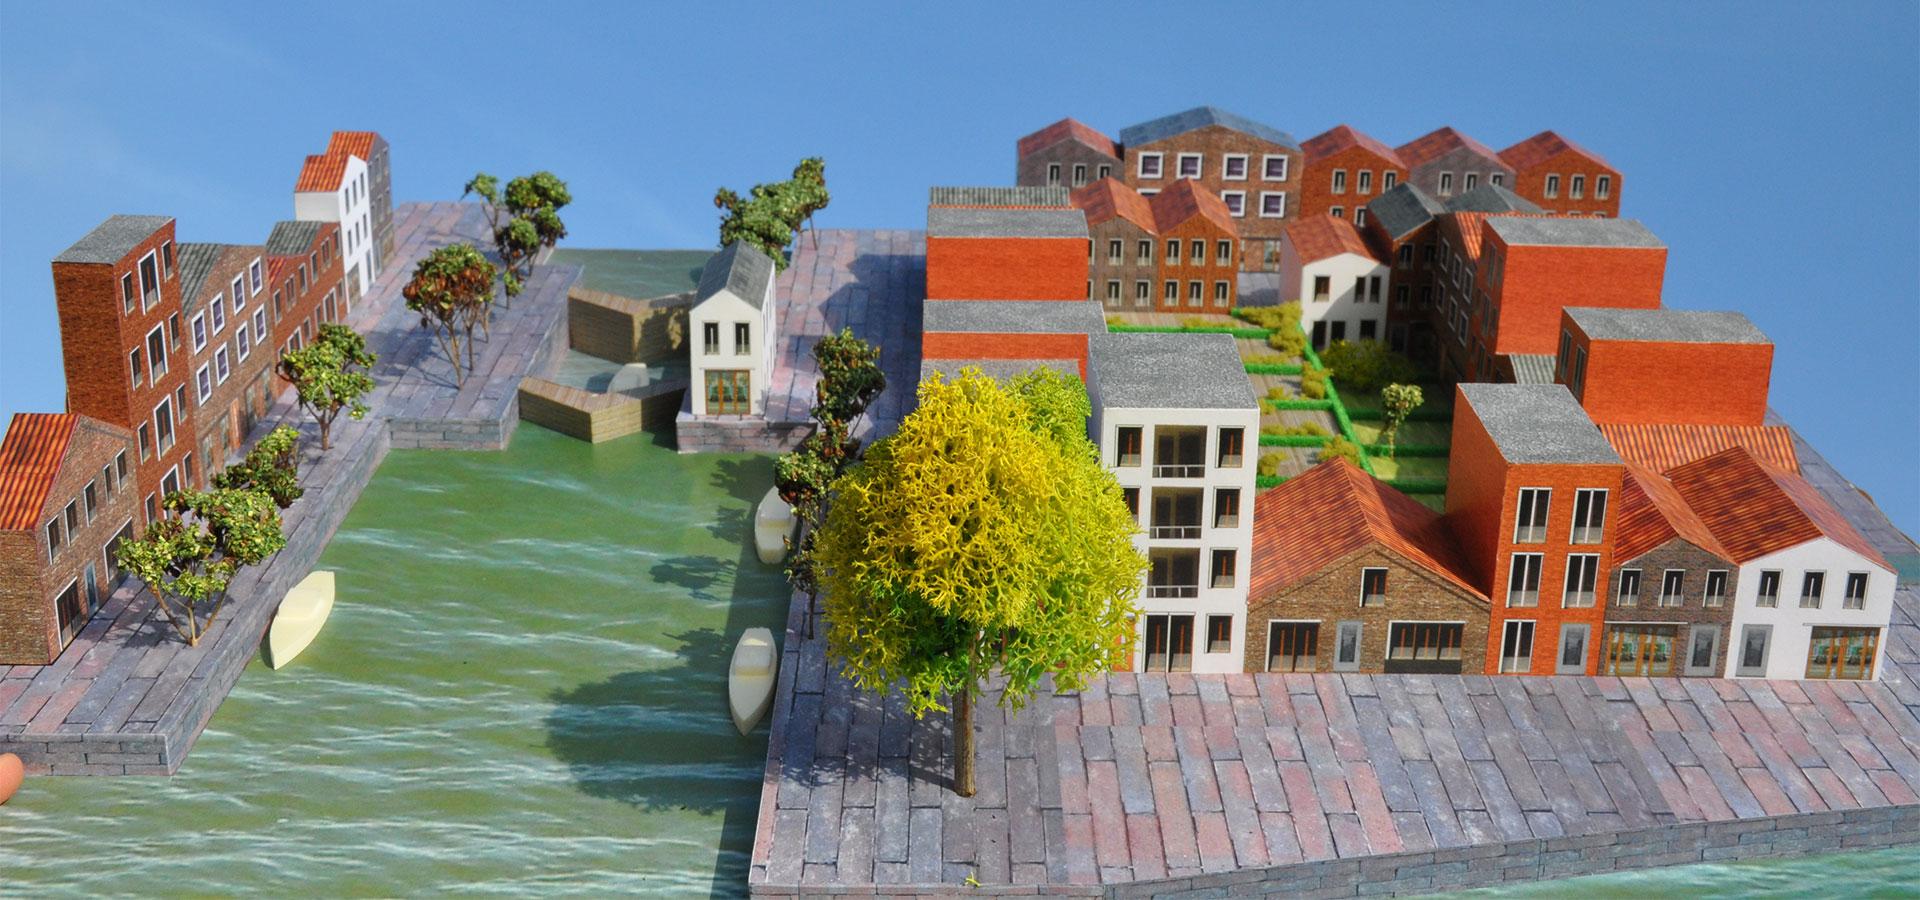 FARO architecten Westflank Haarlemmermeer 02